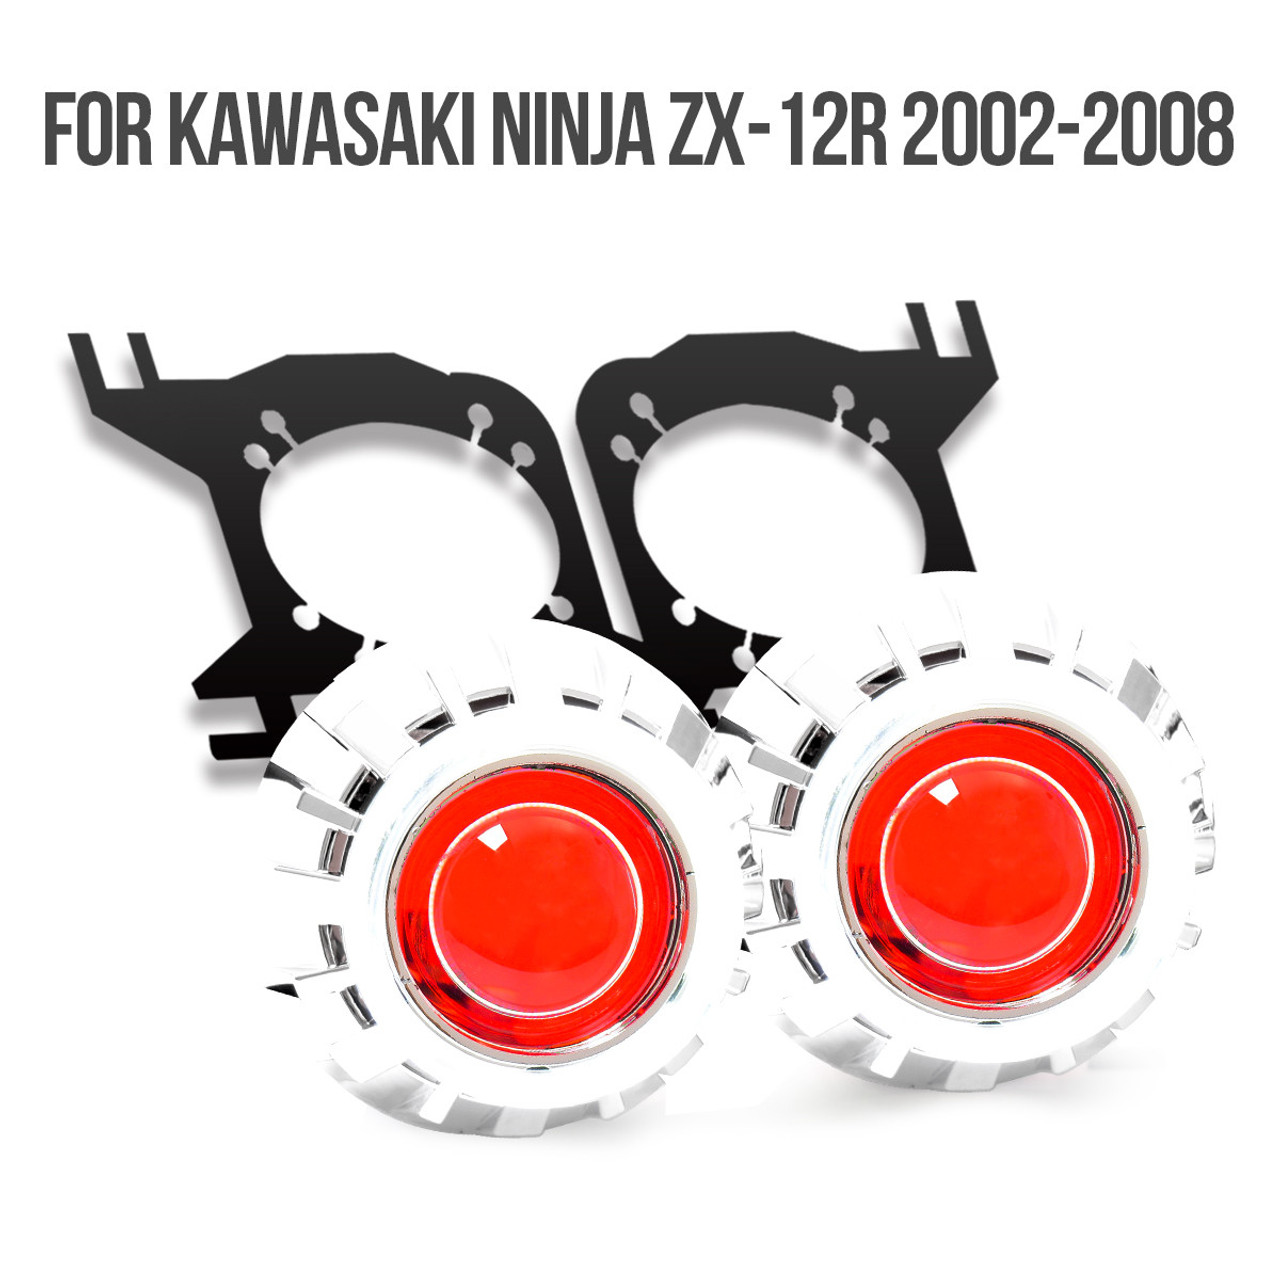 medium resolution of 2002 2003 2004 2005 2006 2007 2008 kawasaki ninja zx12r projector kit